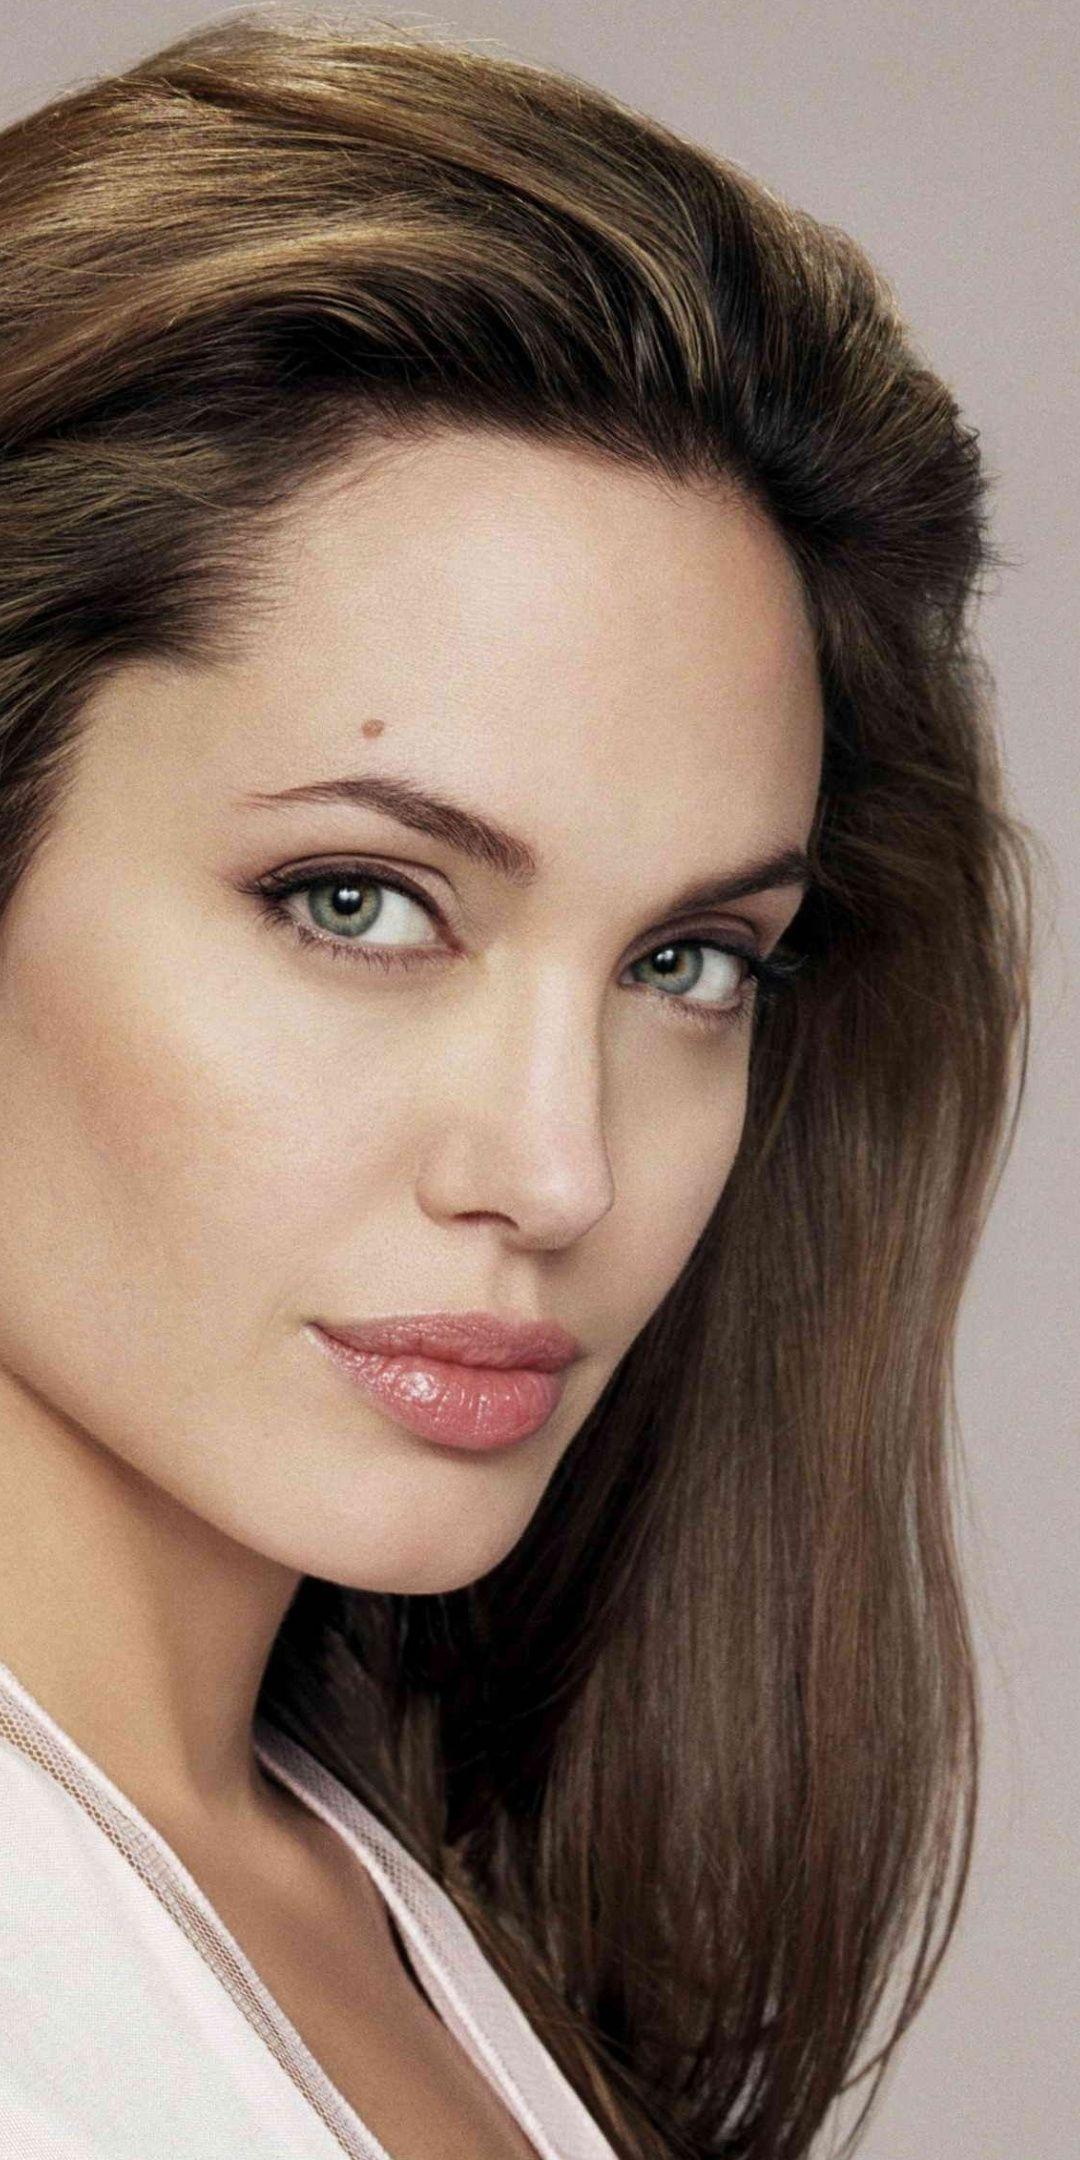 Angelina Jolie Gorgeous Actress Celebrity 1080x2160 Wallpaper Angelina Jolie Photoshoot Angelina Jolie Makeup Angelina Jolie 90s